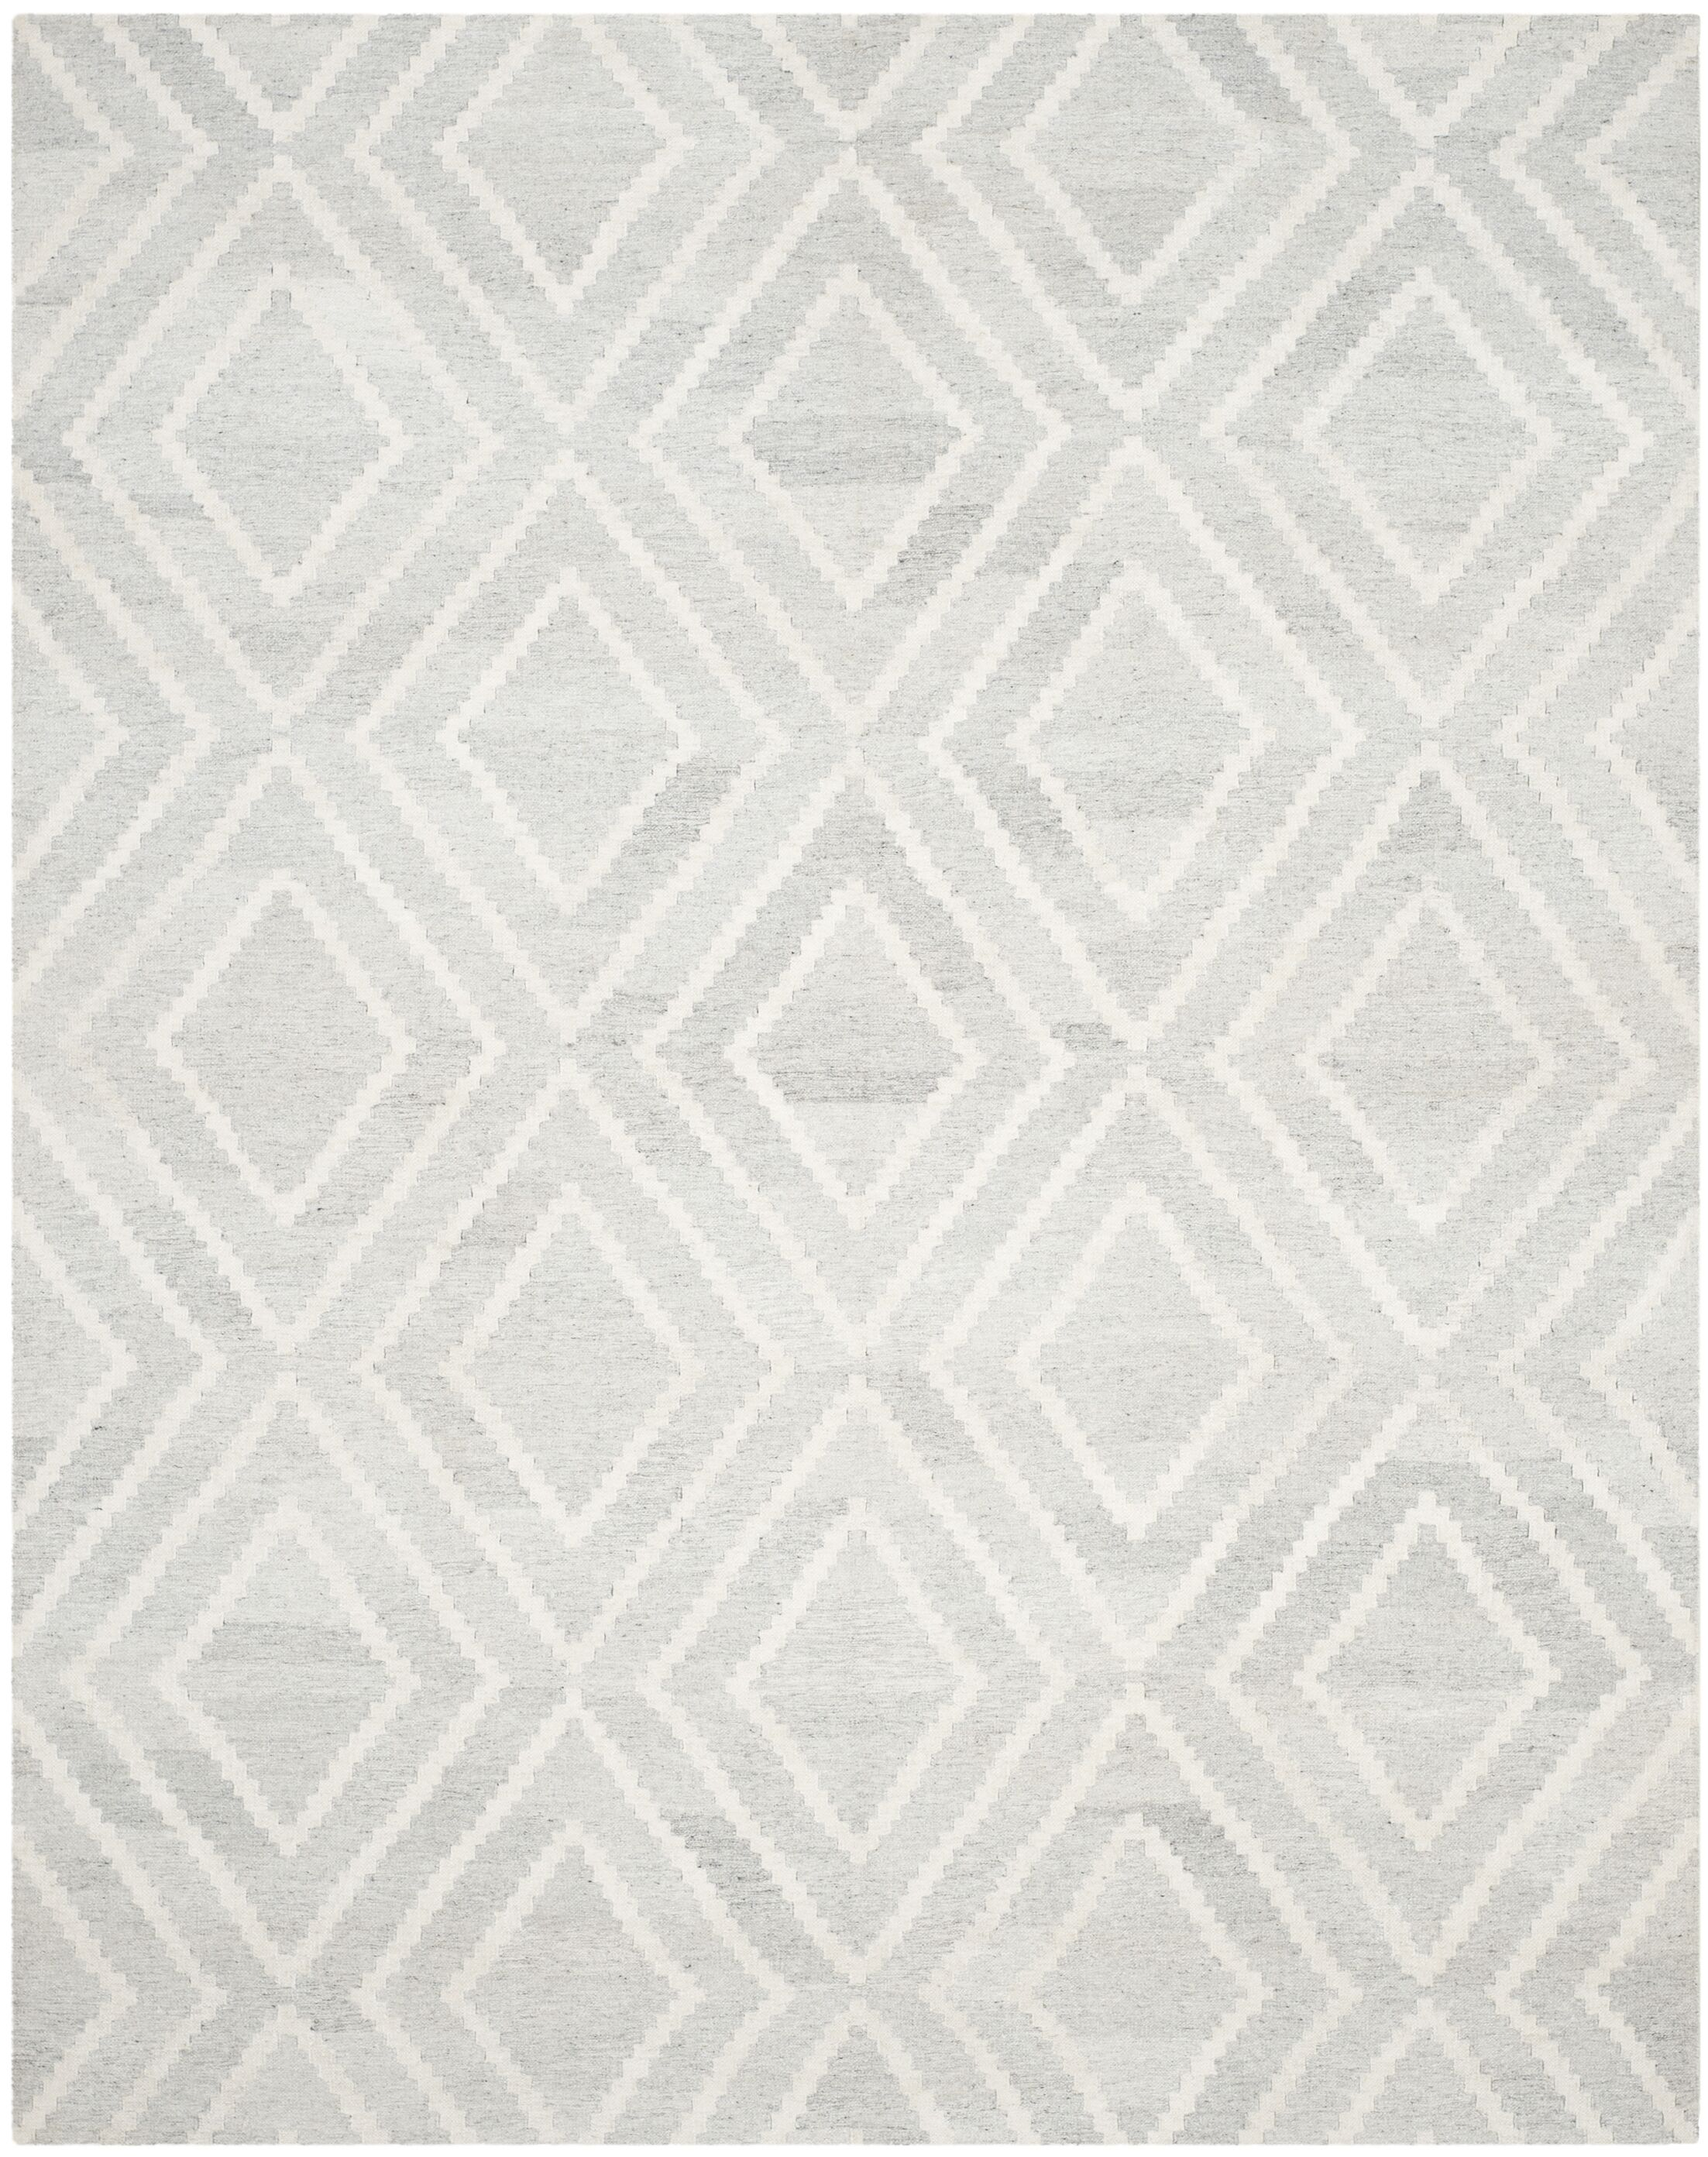 Mata Hand Woven Wool Gray/Ivory Area Rug Rug Size: Rectangle 8' x 10'